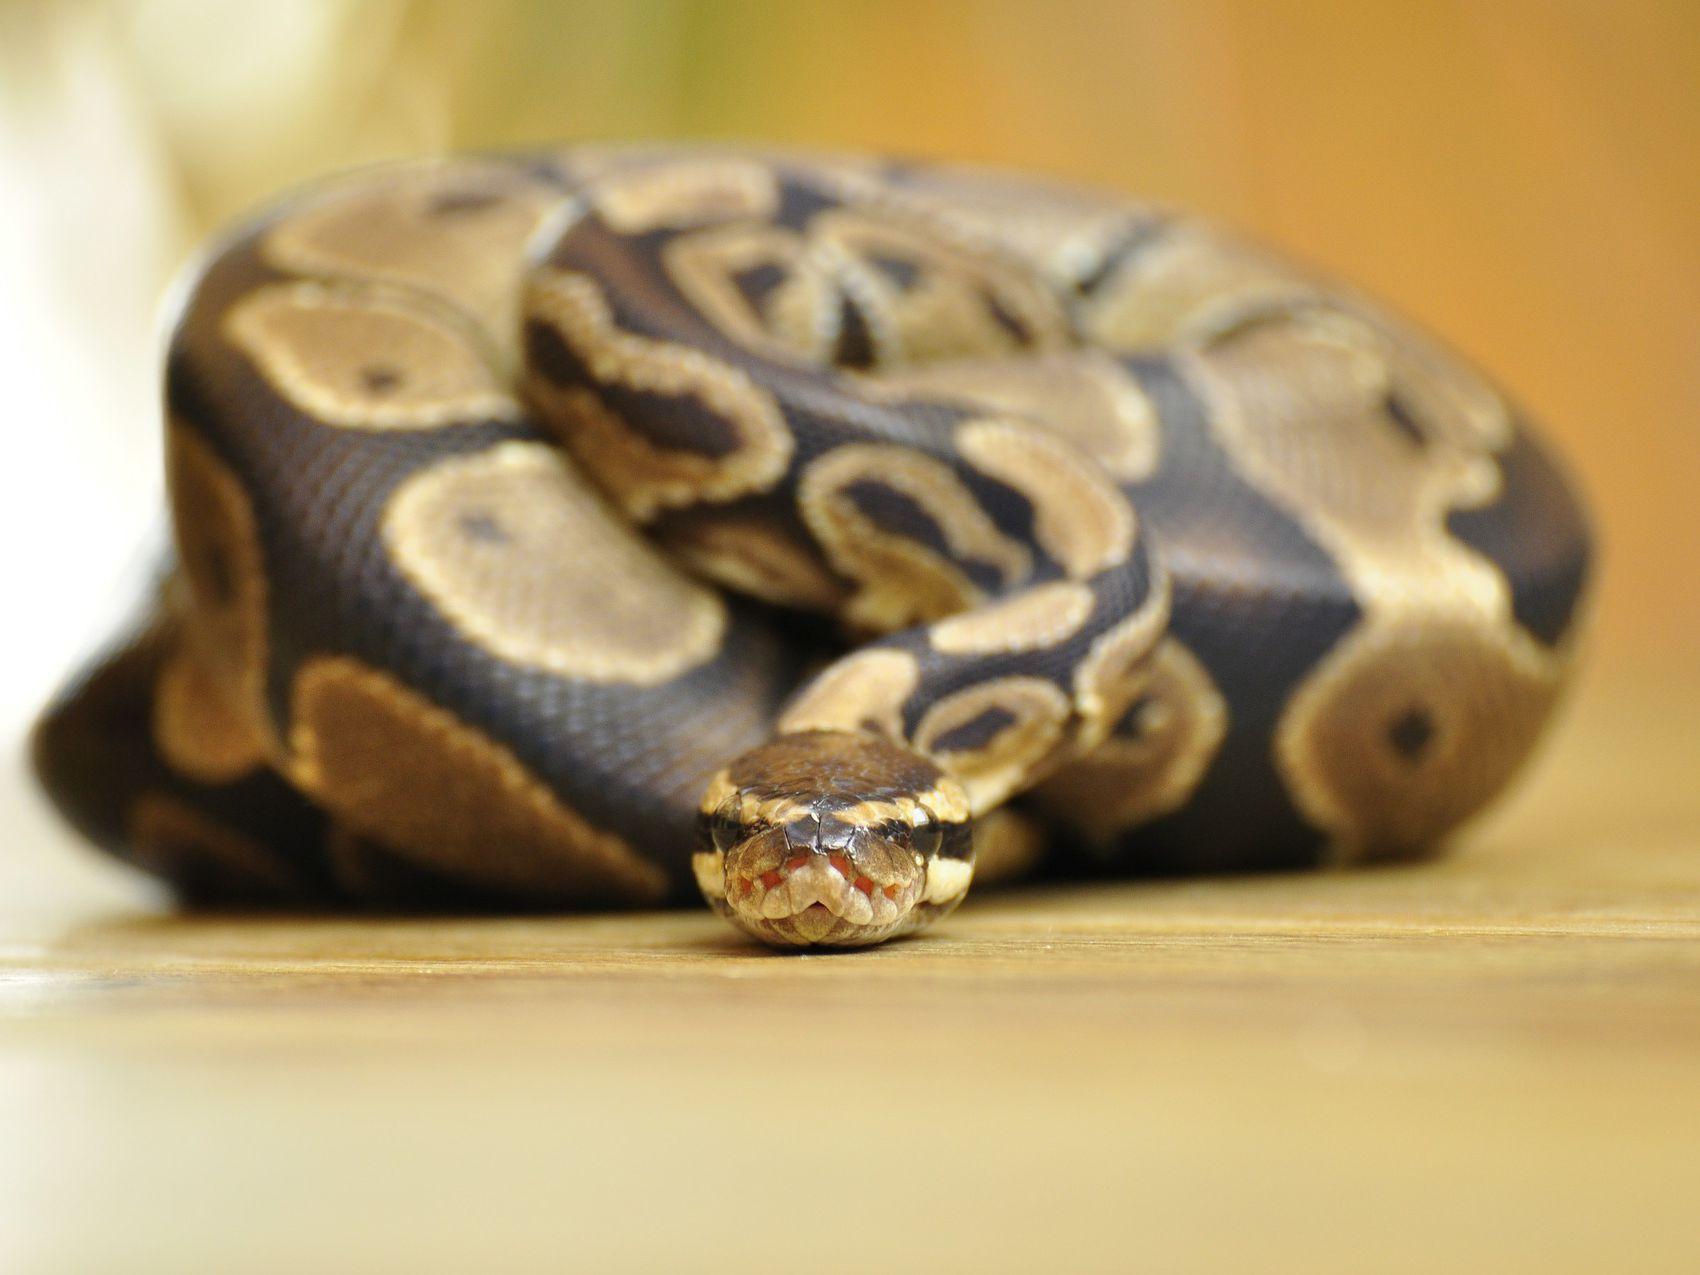 Feeding Your Pet Ball Pythons